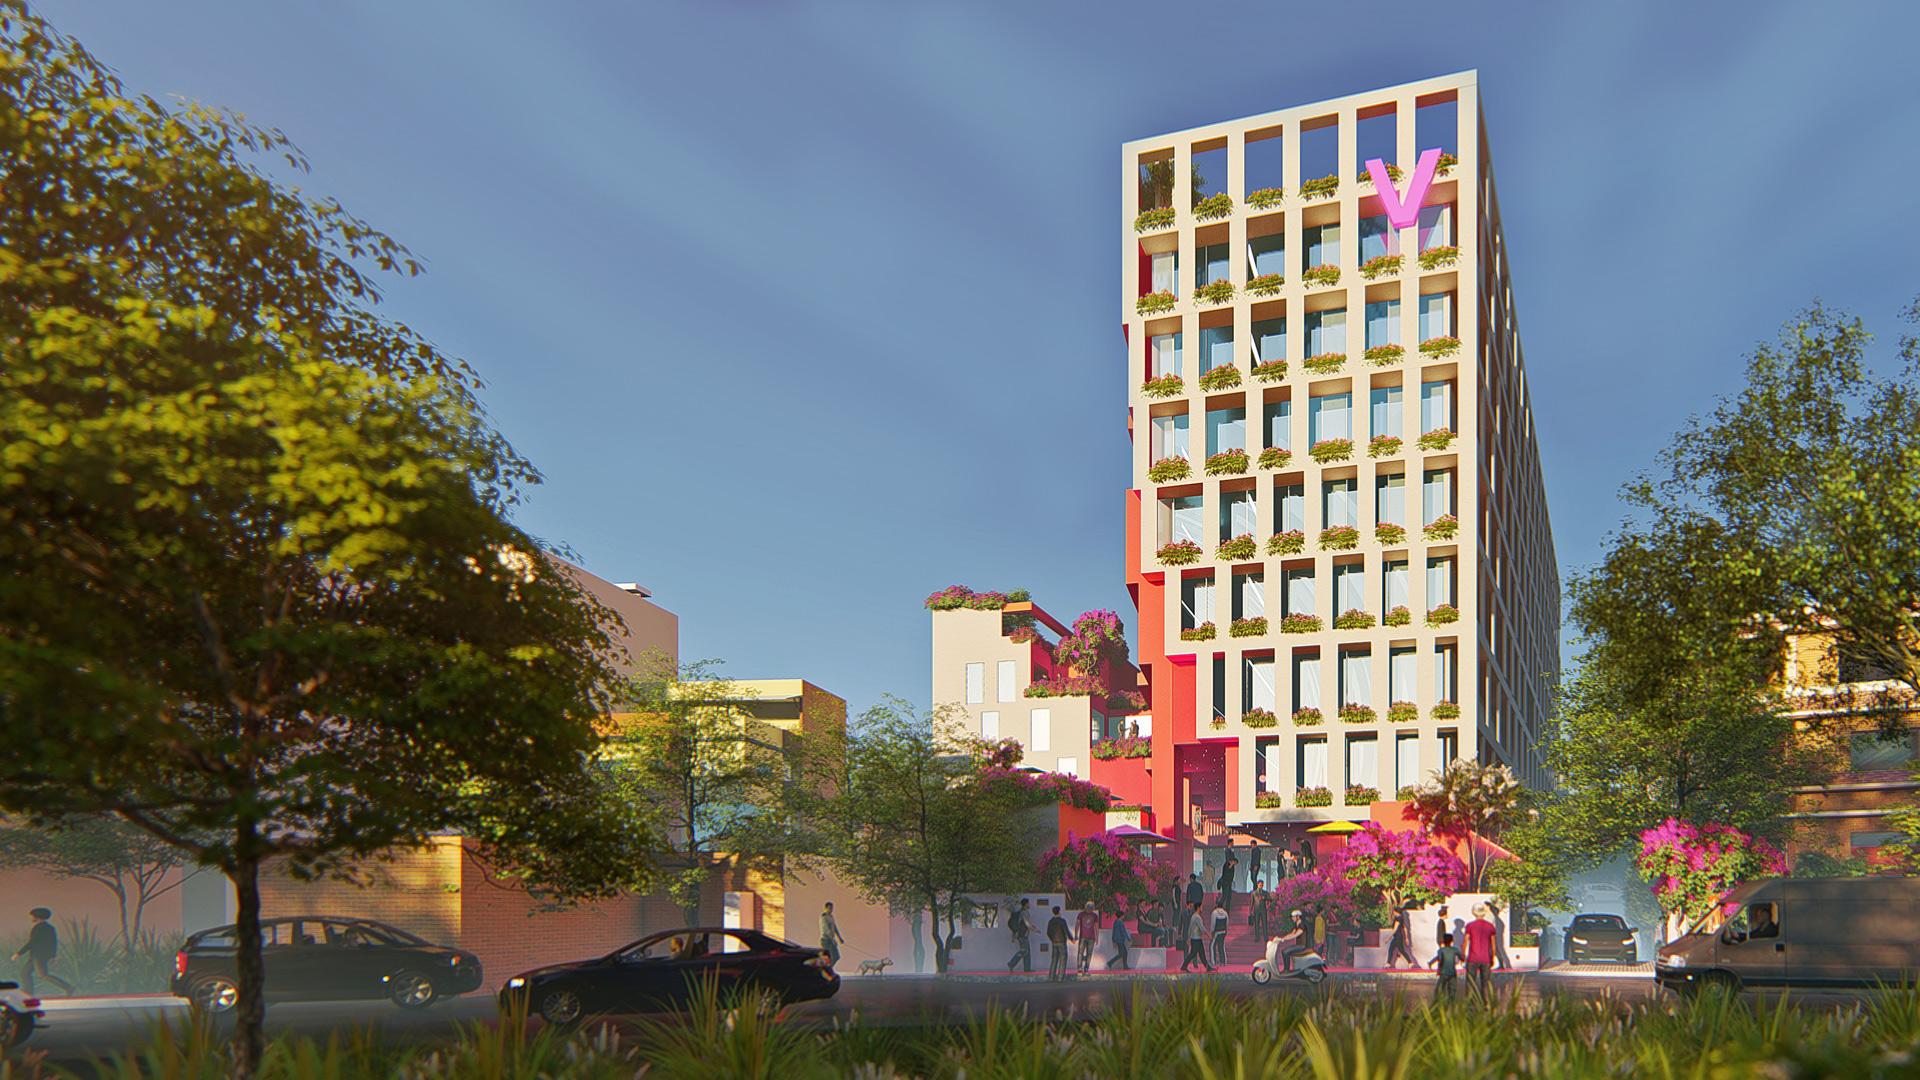 MAP_Design_Architecture_Retail_Mixed_Use_Architect_Kiran_Mathema_Shopping_arcade_Louver_facade_Street_Tower